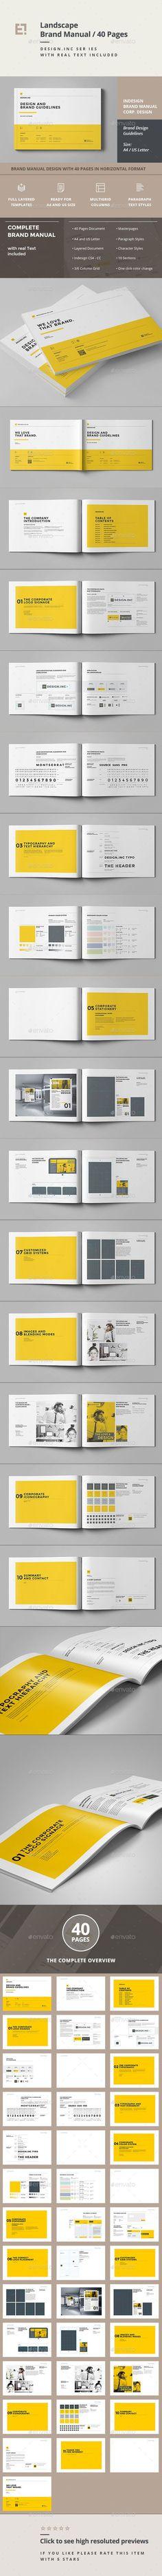 Brand Manual Template #design Download: http://graphicriver.net/item/brand-manual/11805697?ref=ksioks